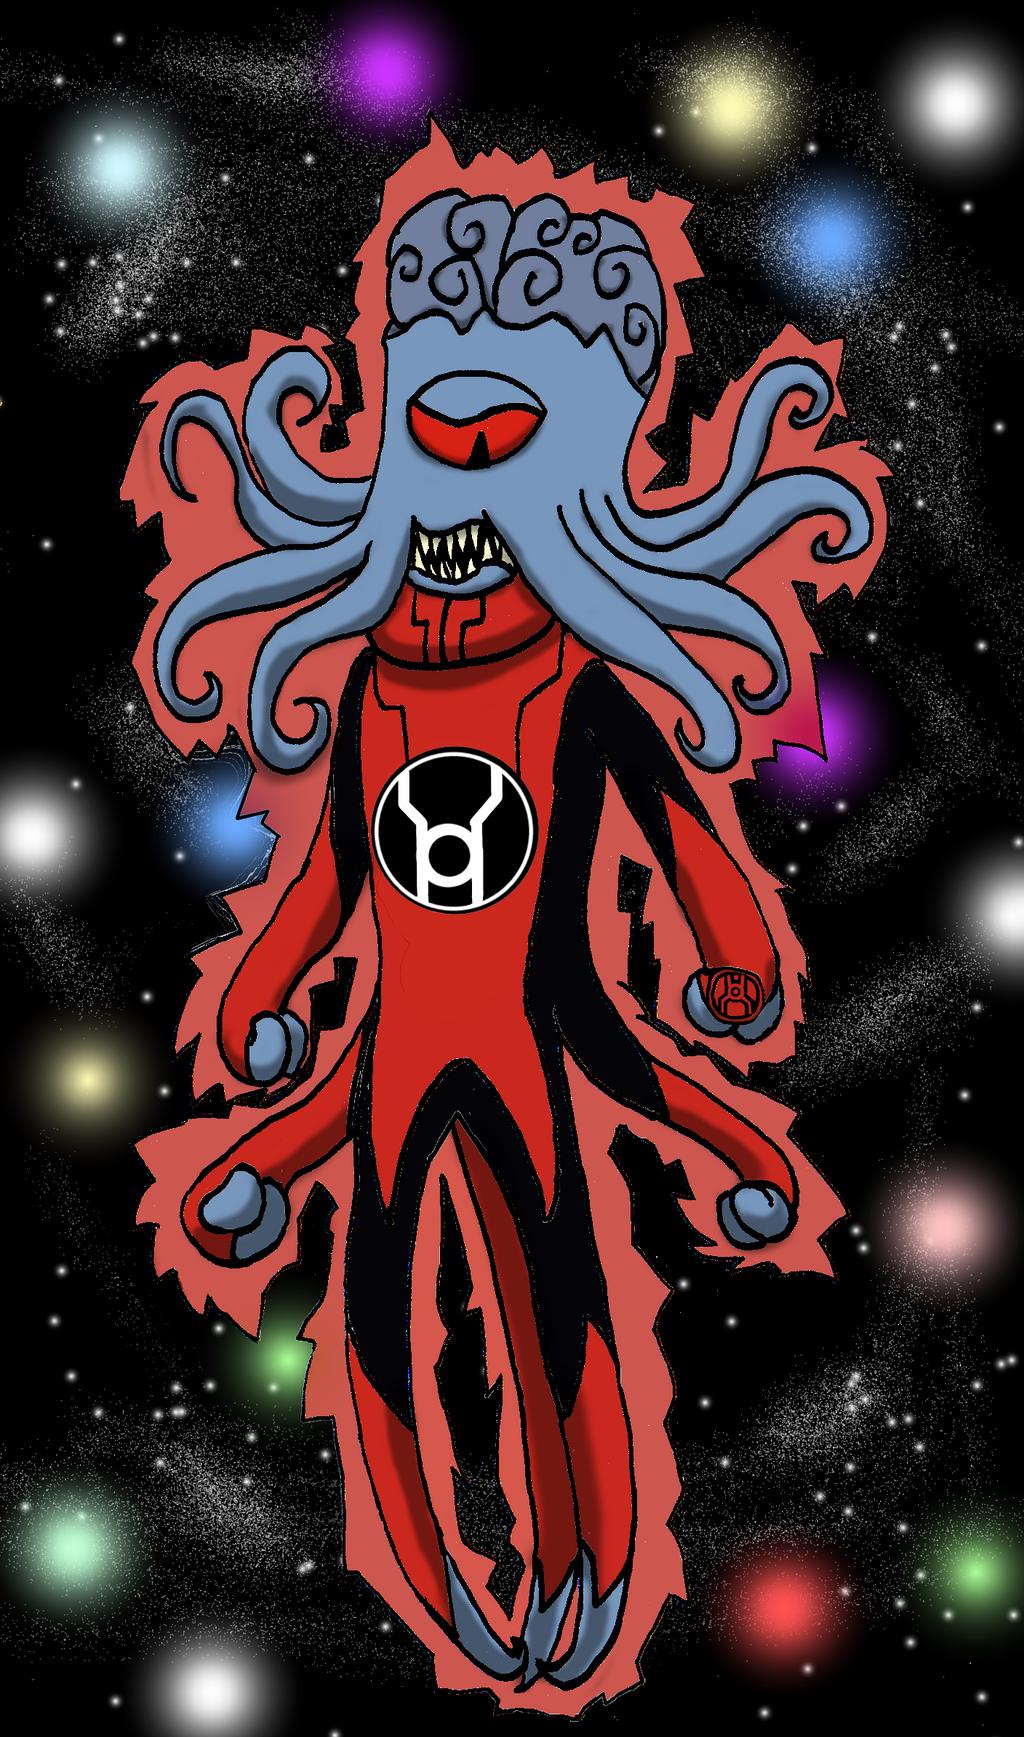 Dalek lantern by Fluffy-The-Watcher